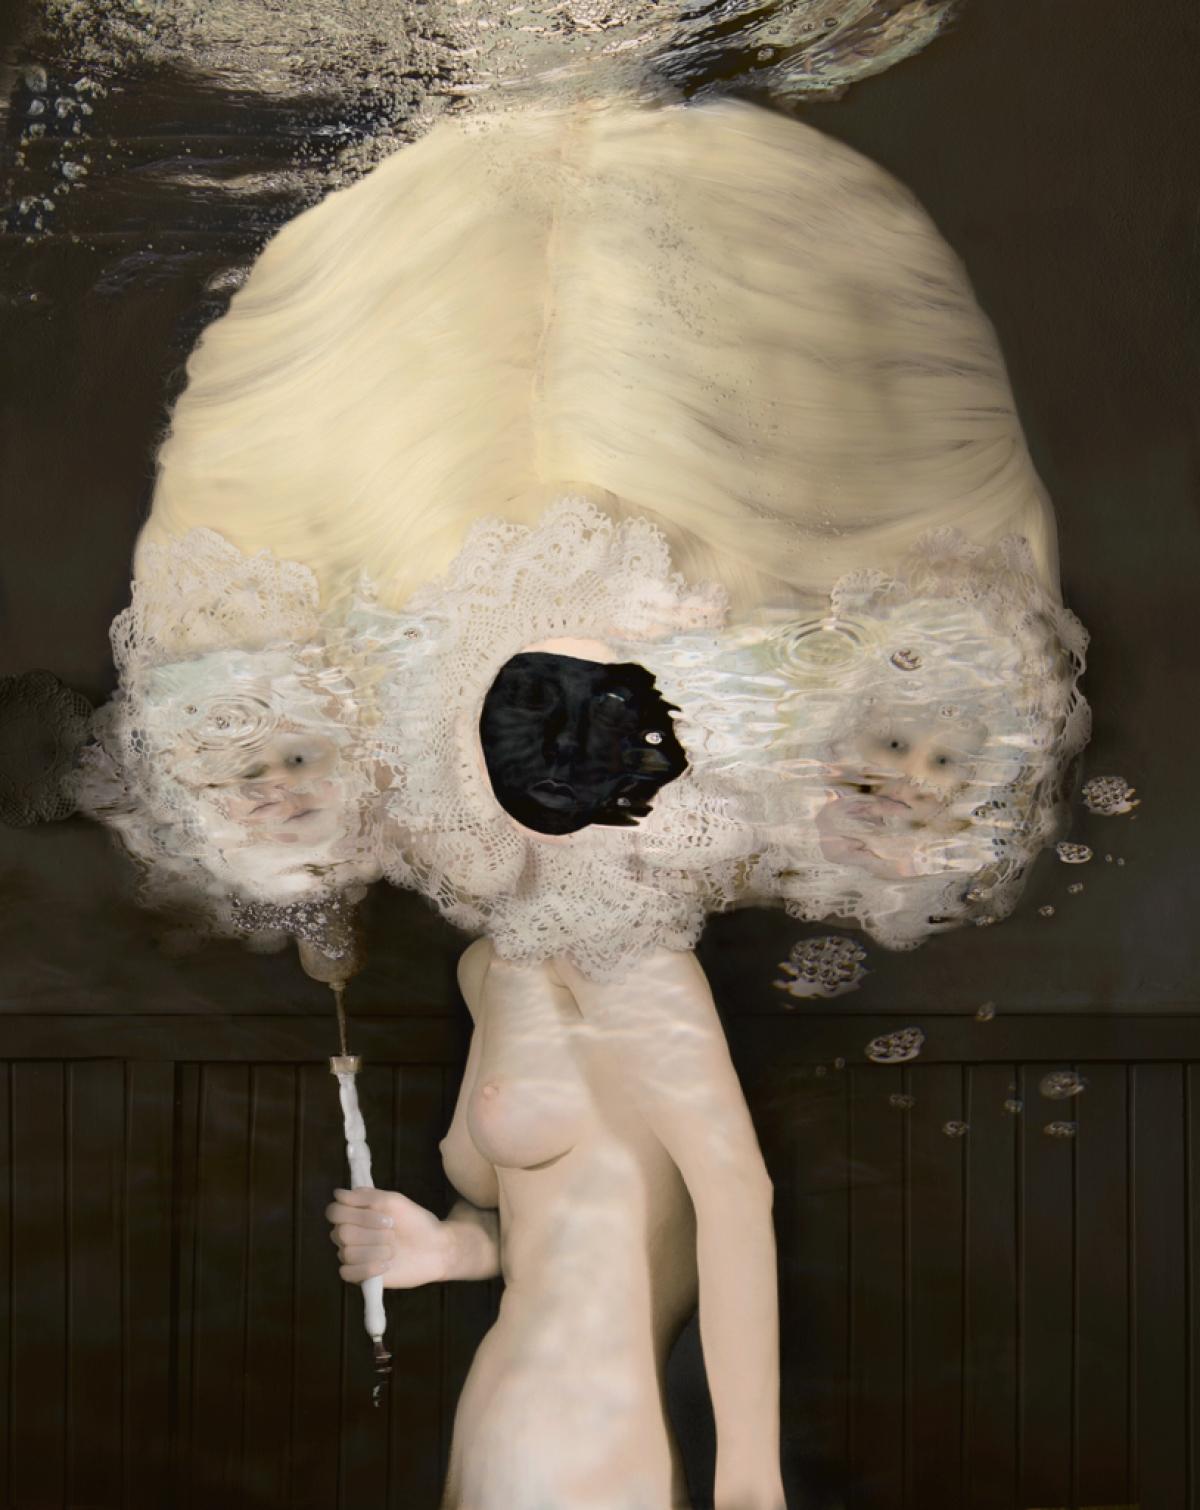 Kunst: La jeune Fille, la Mort et le Temps van kunstenaar dindi .